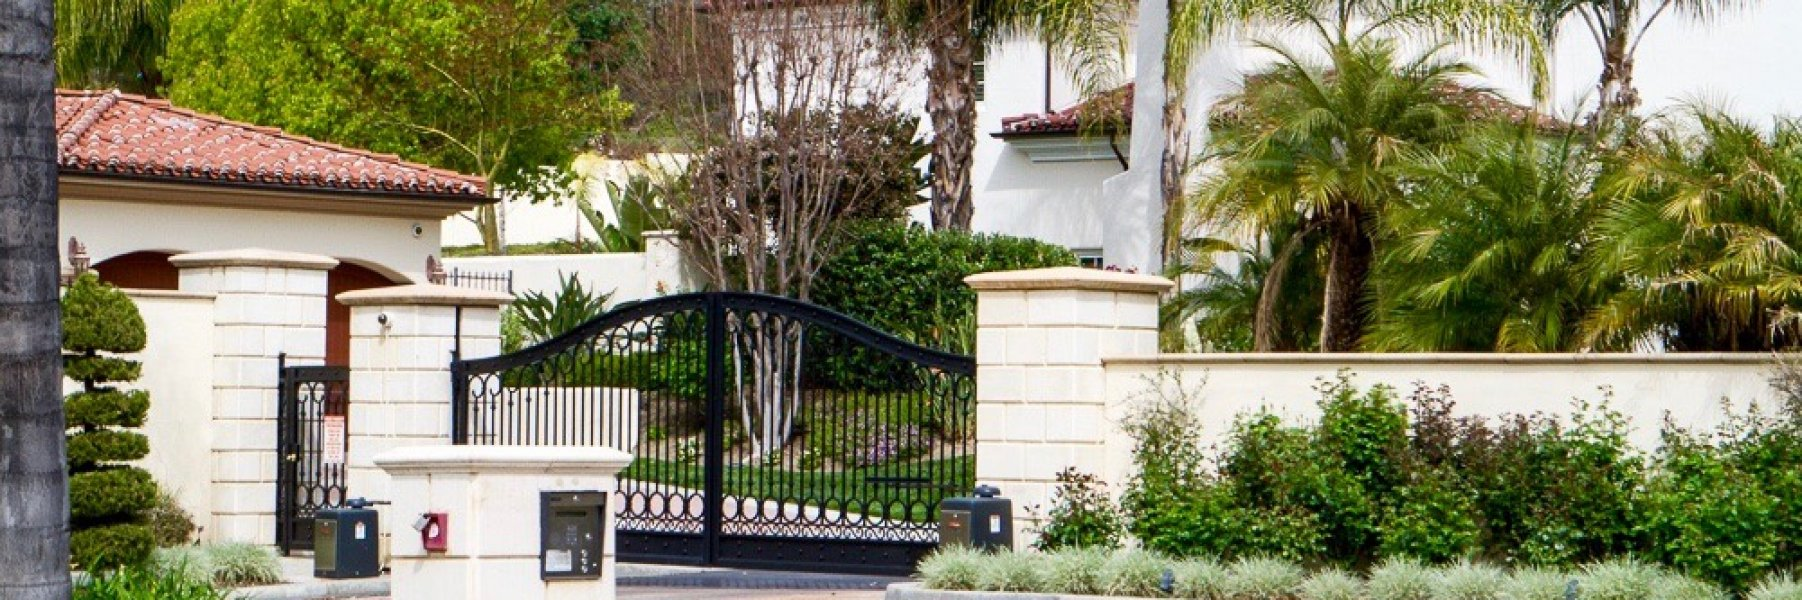 Monte Verde Estates is a community of homes in Tarzana California